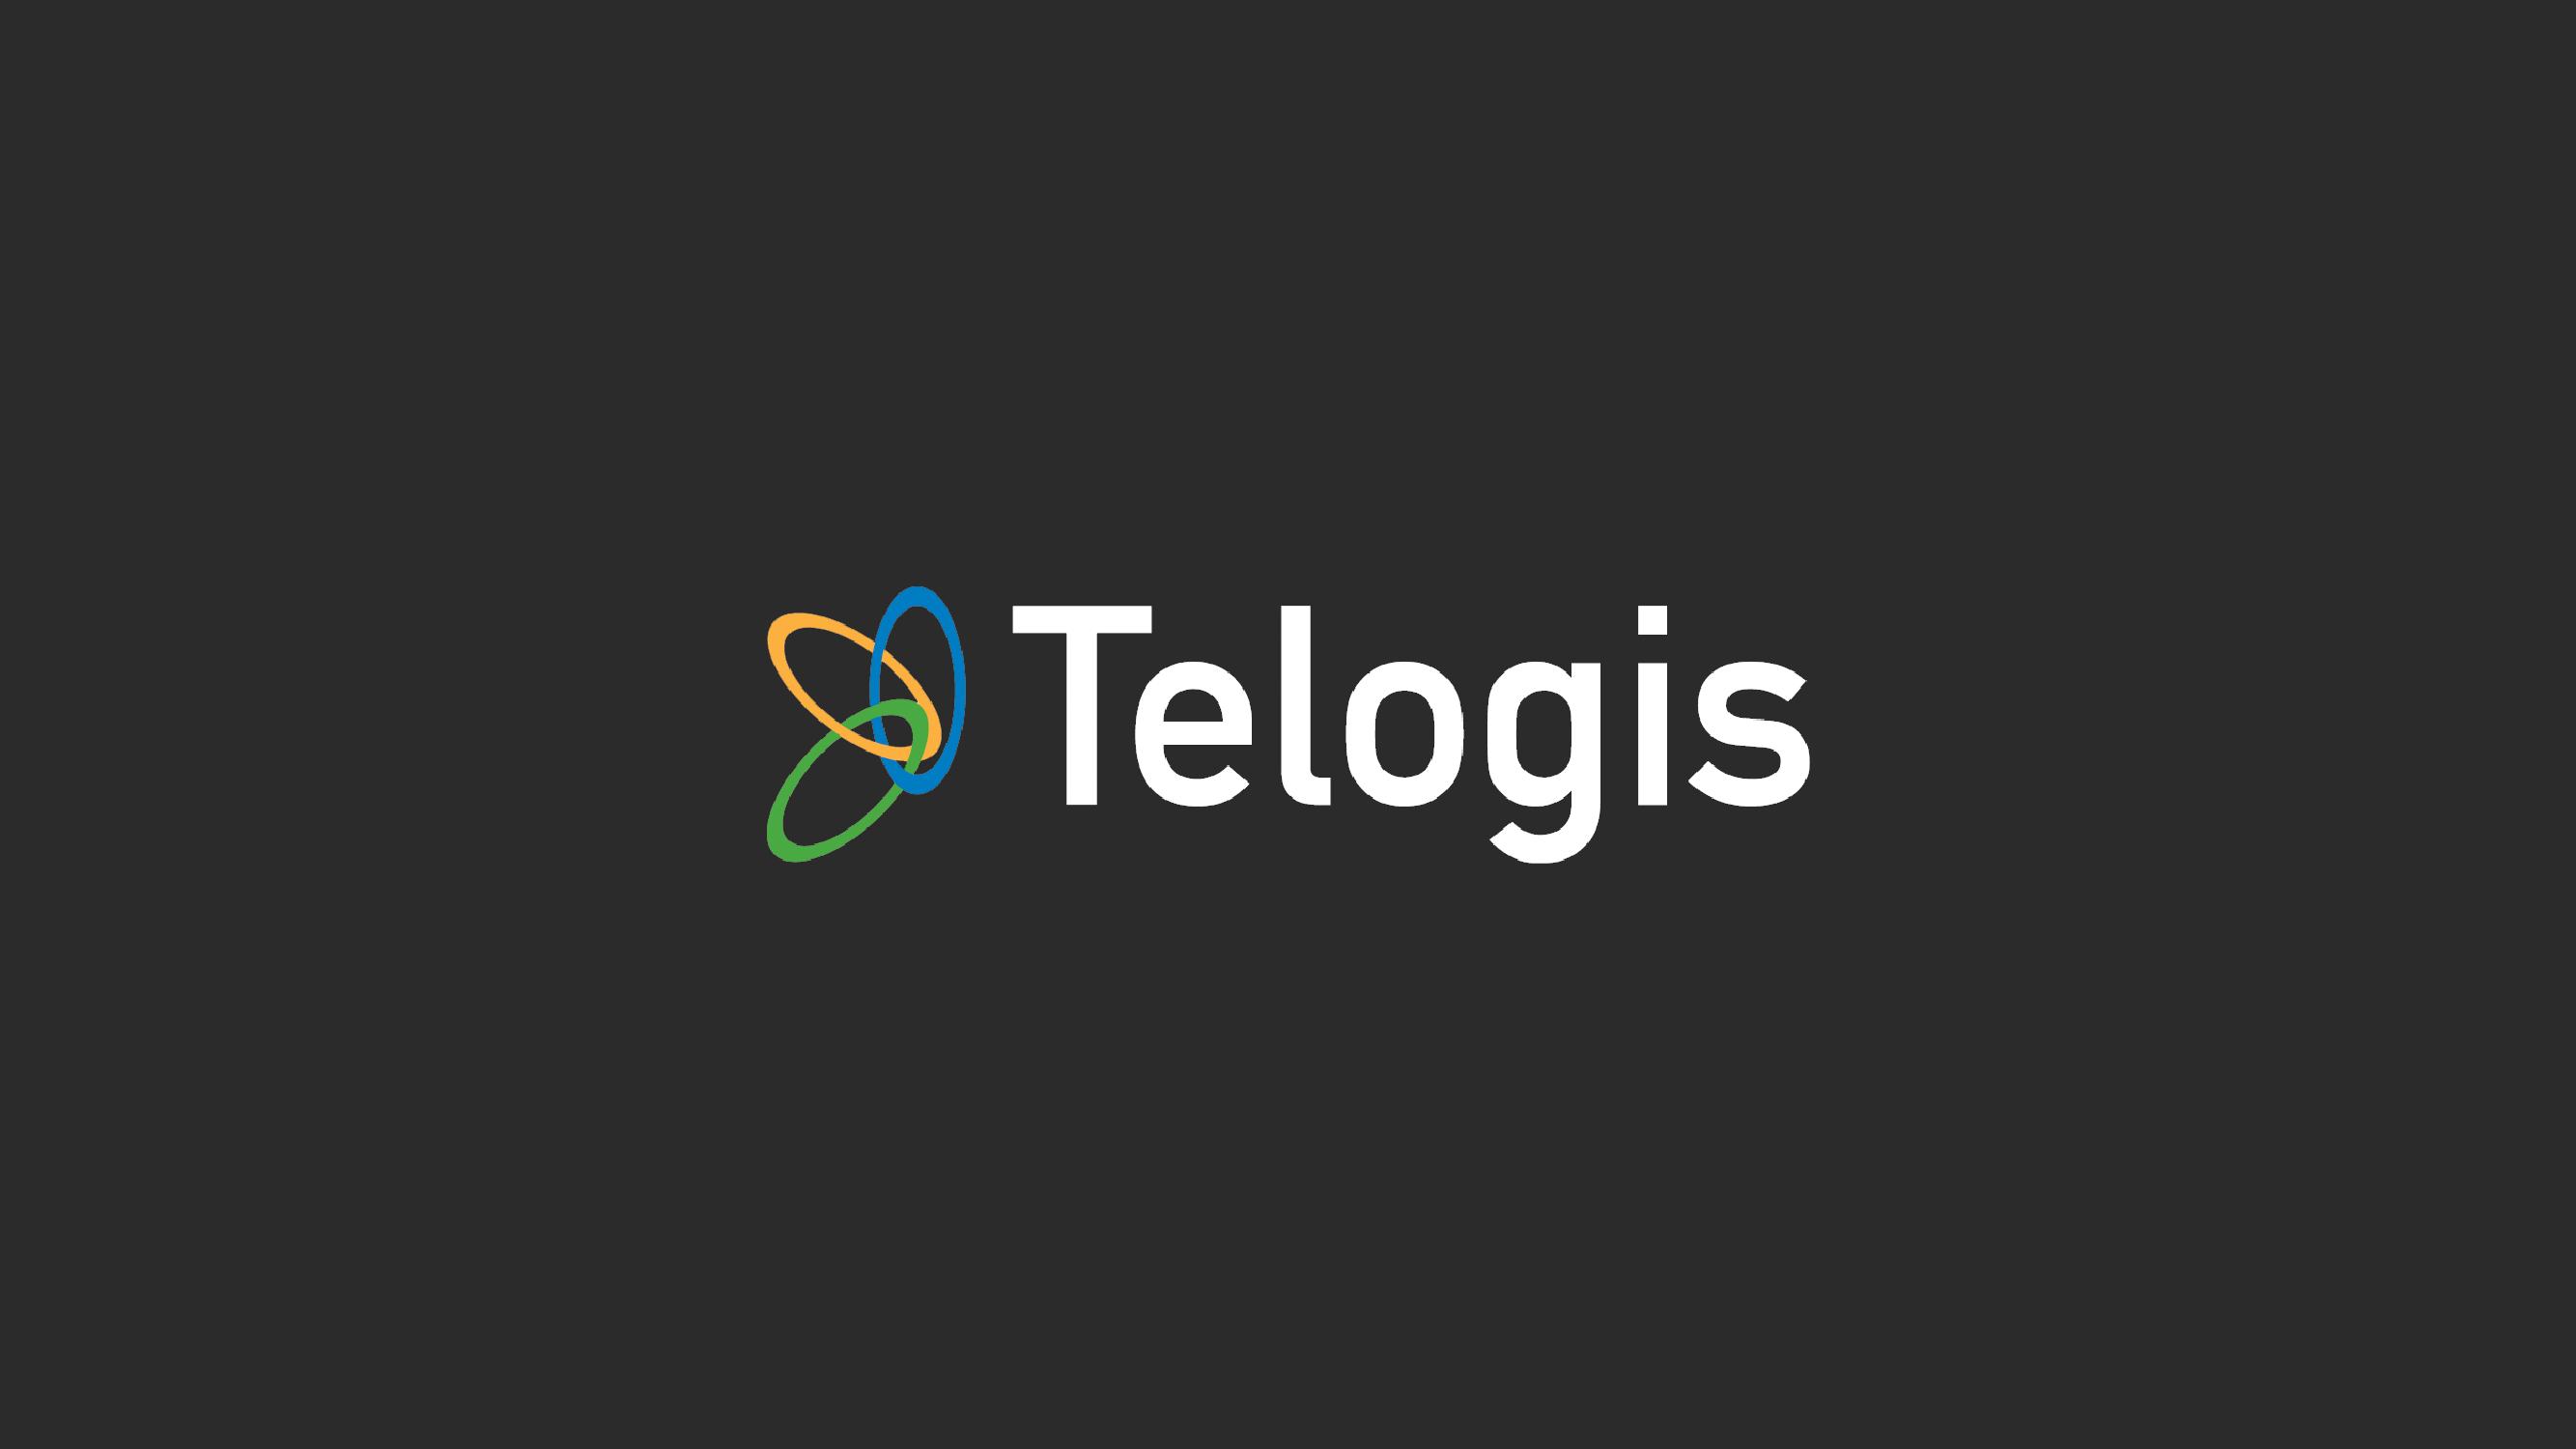 telogis-02